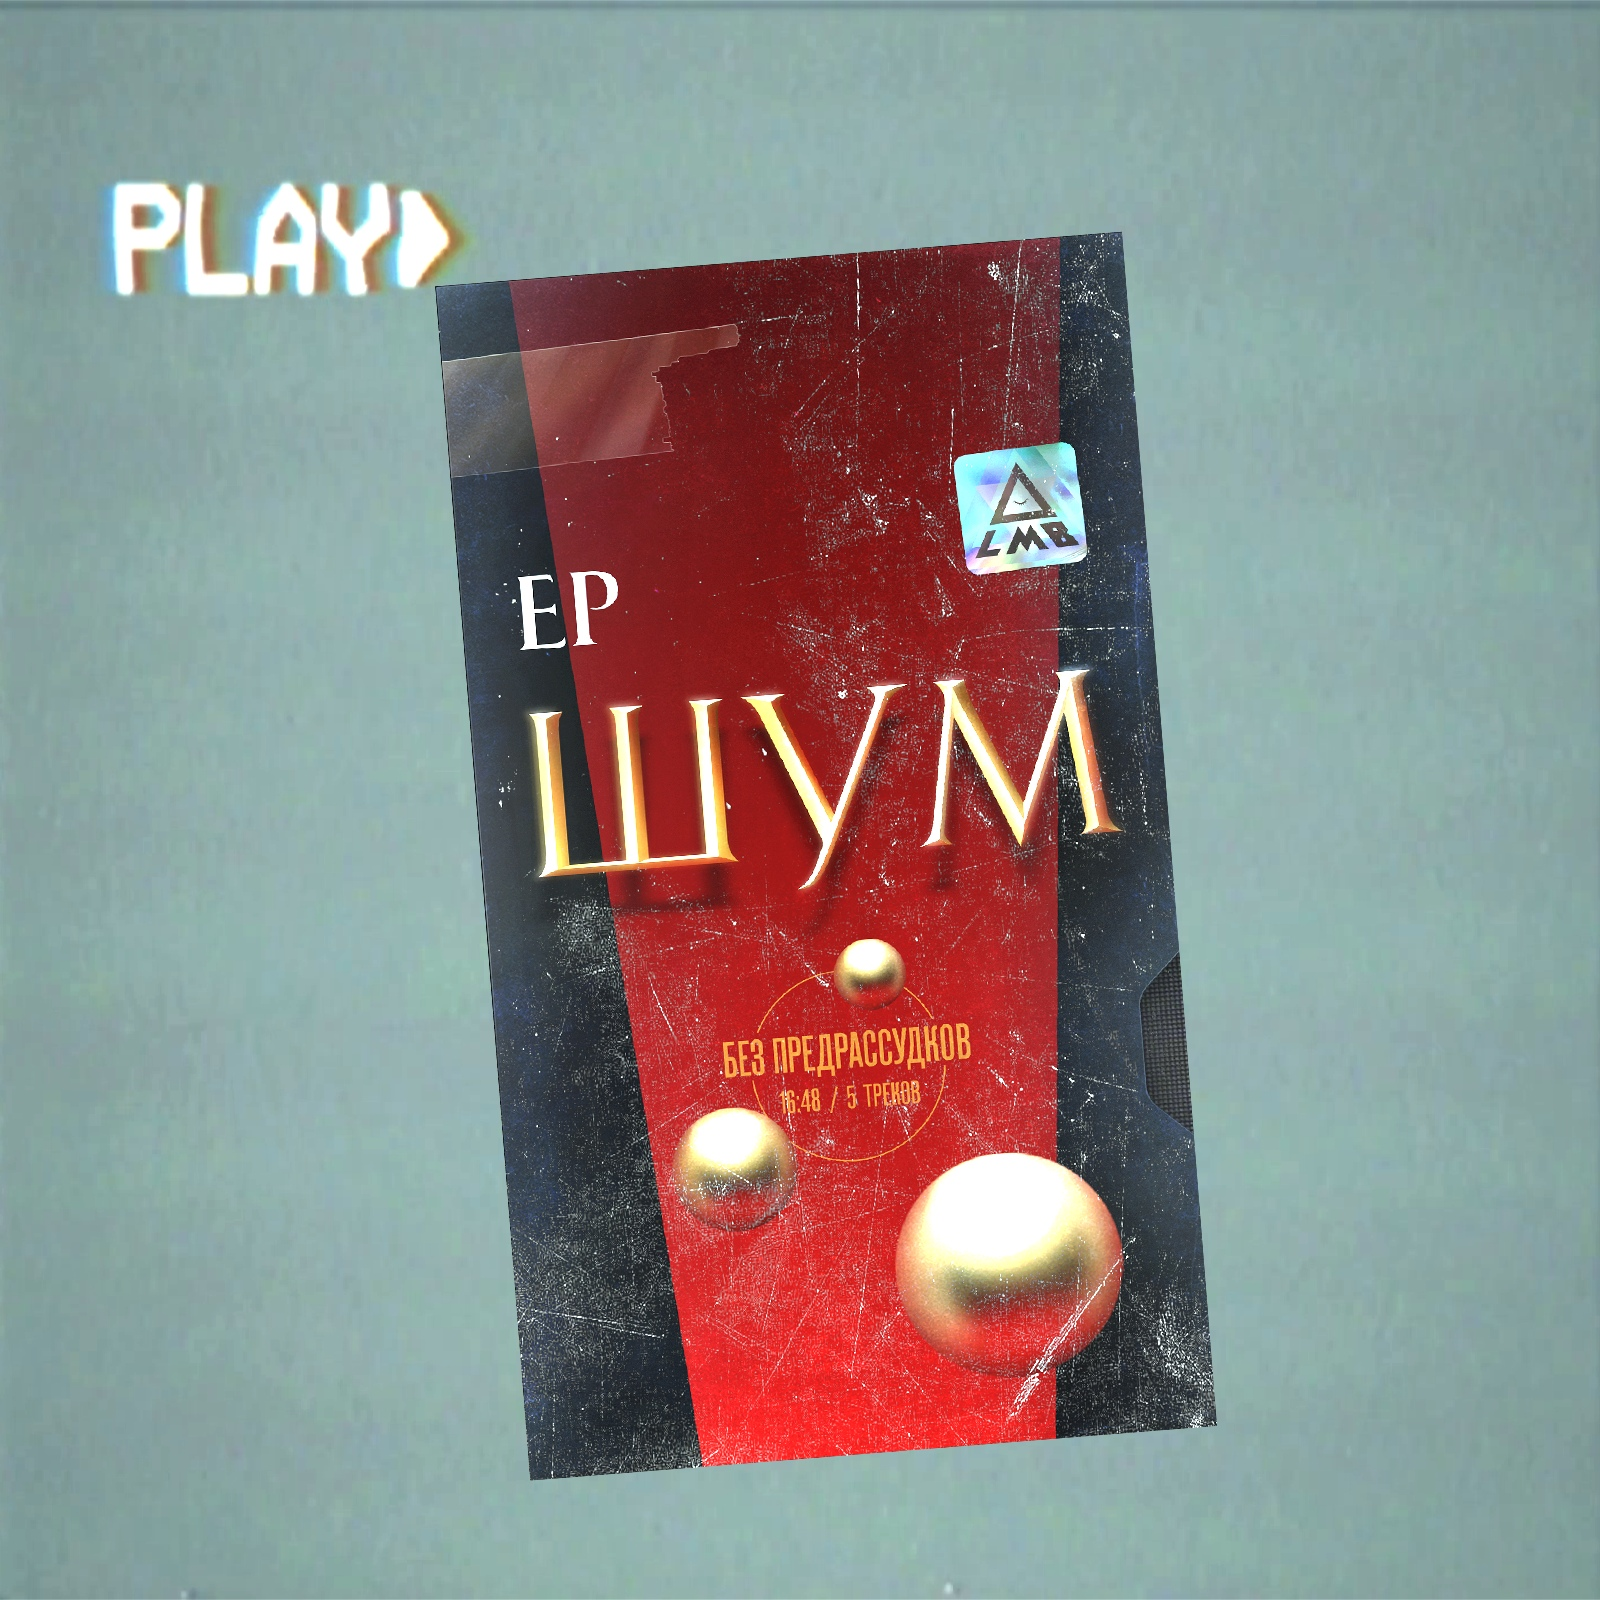 LMB - Шум [EP]